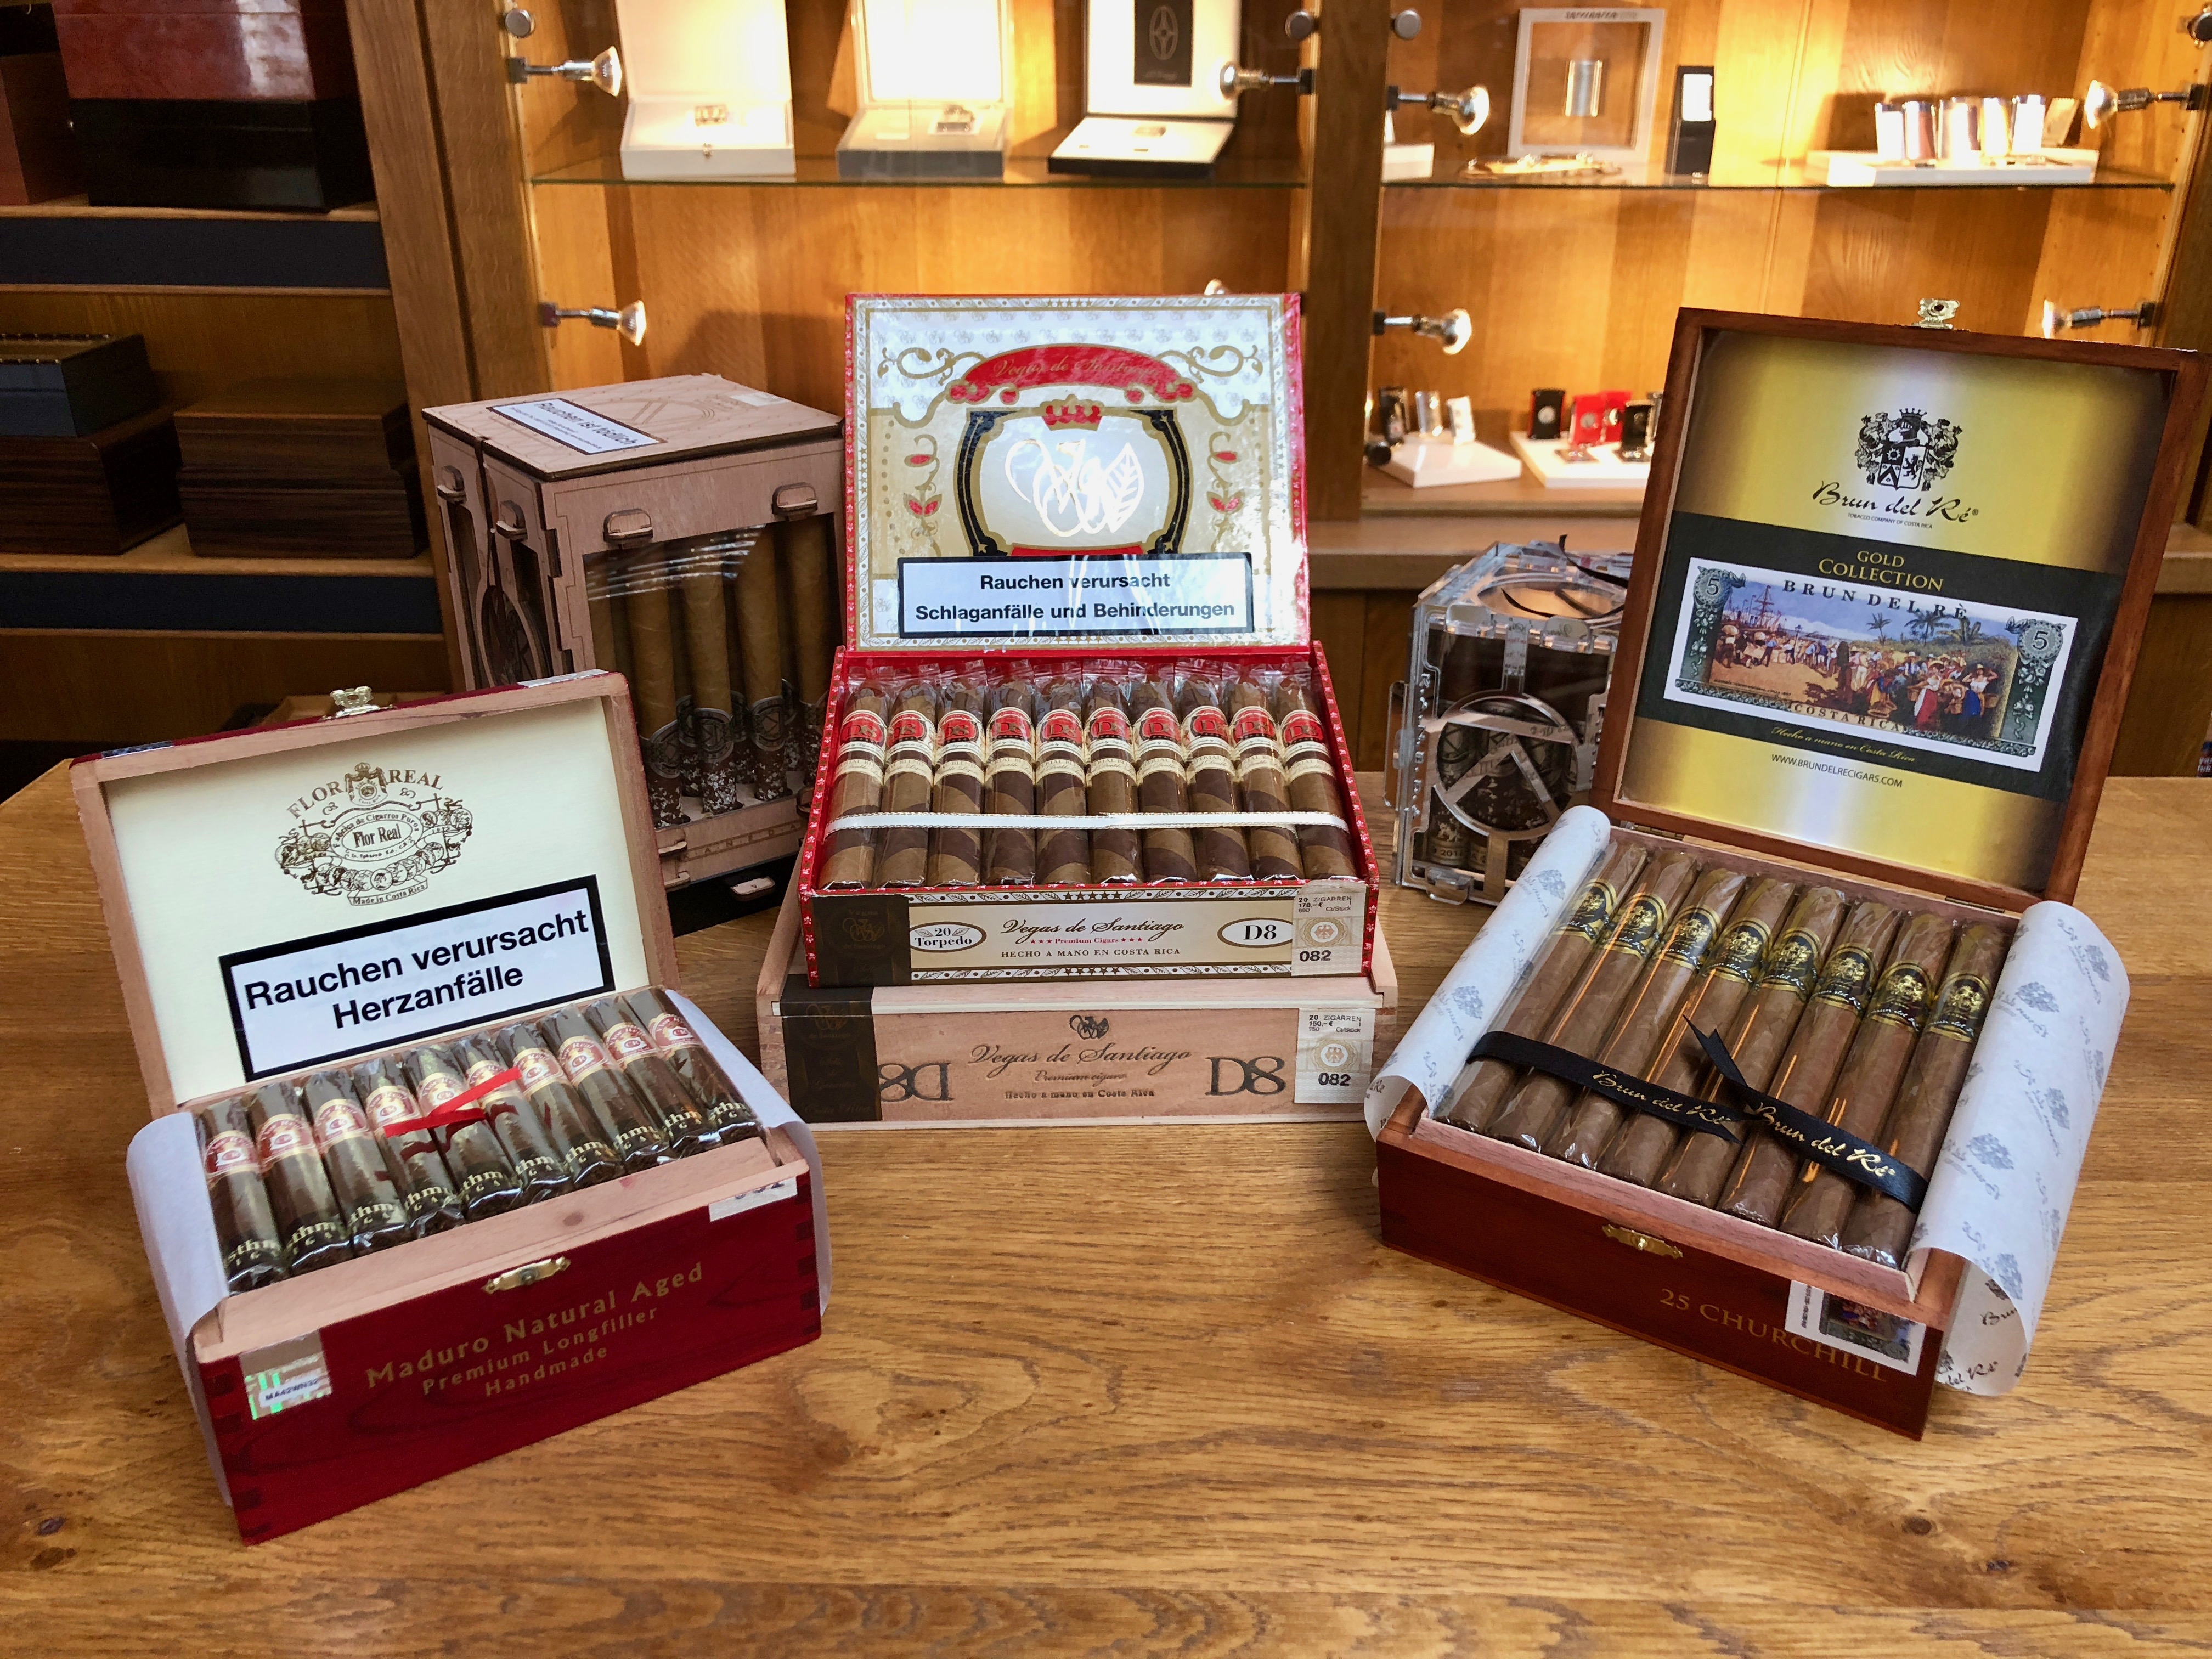 Zigarren aus Costa Rica